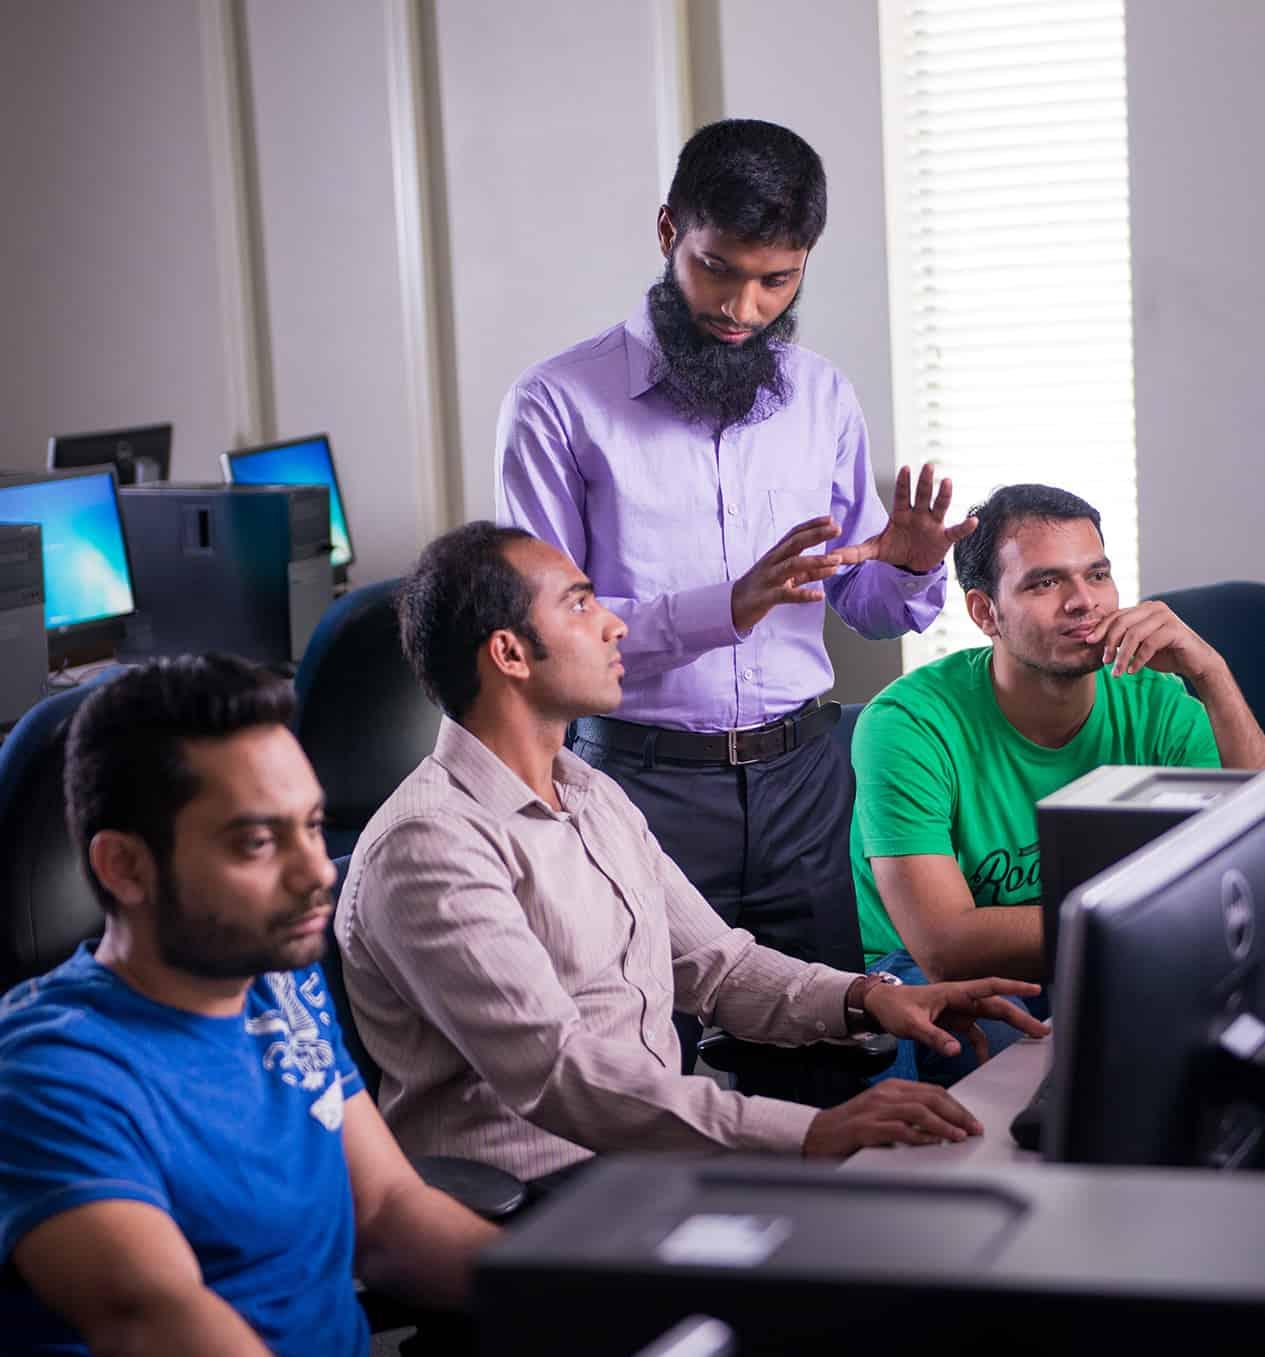 Professor helping three students at computers